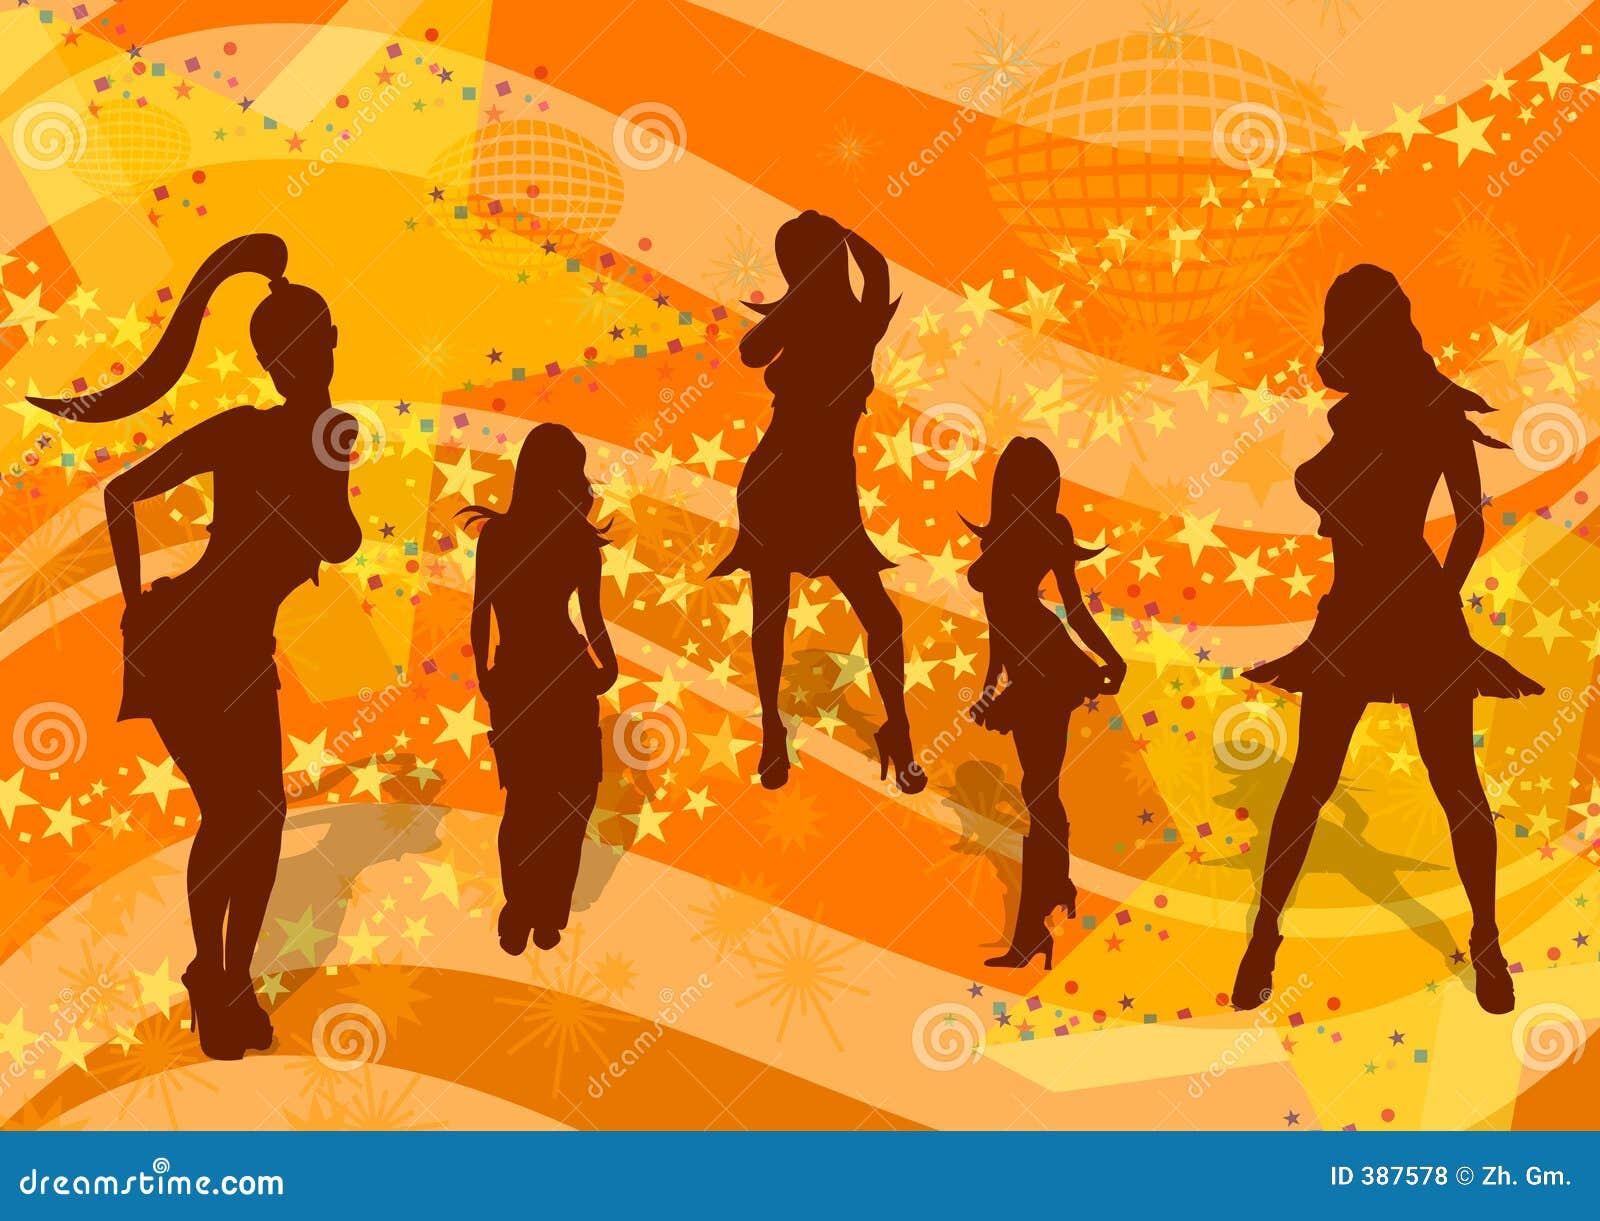 Background Disco Girls Stock Illustrations 1 982 Background Disco Girls Stock Illustrations Vectors Clipart Dreamstime